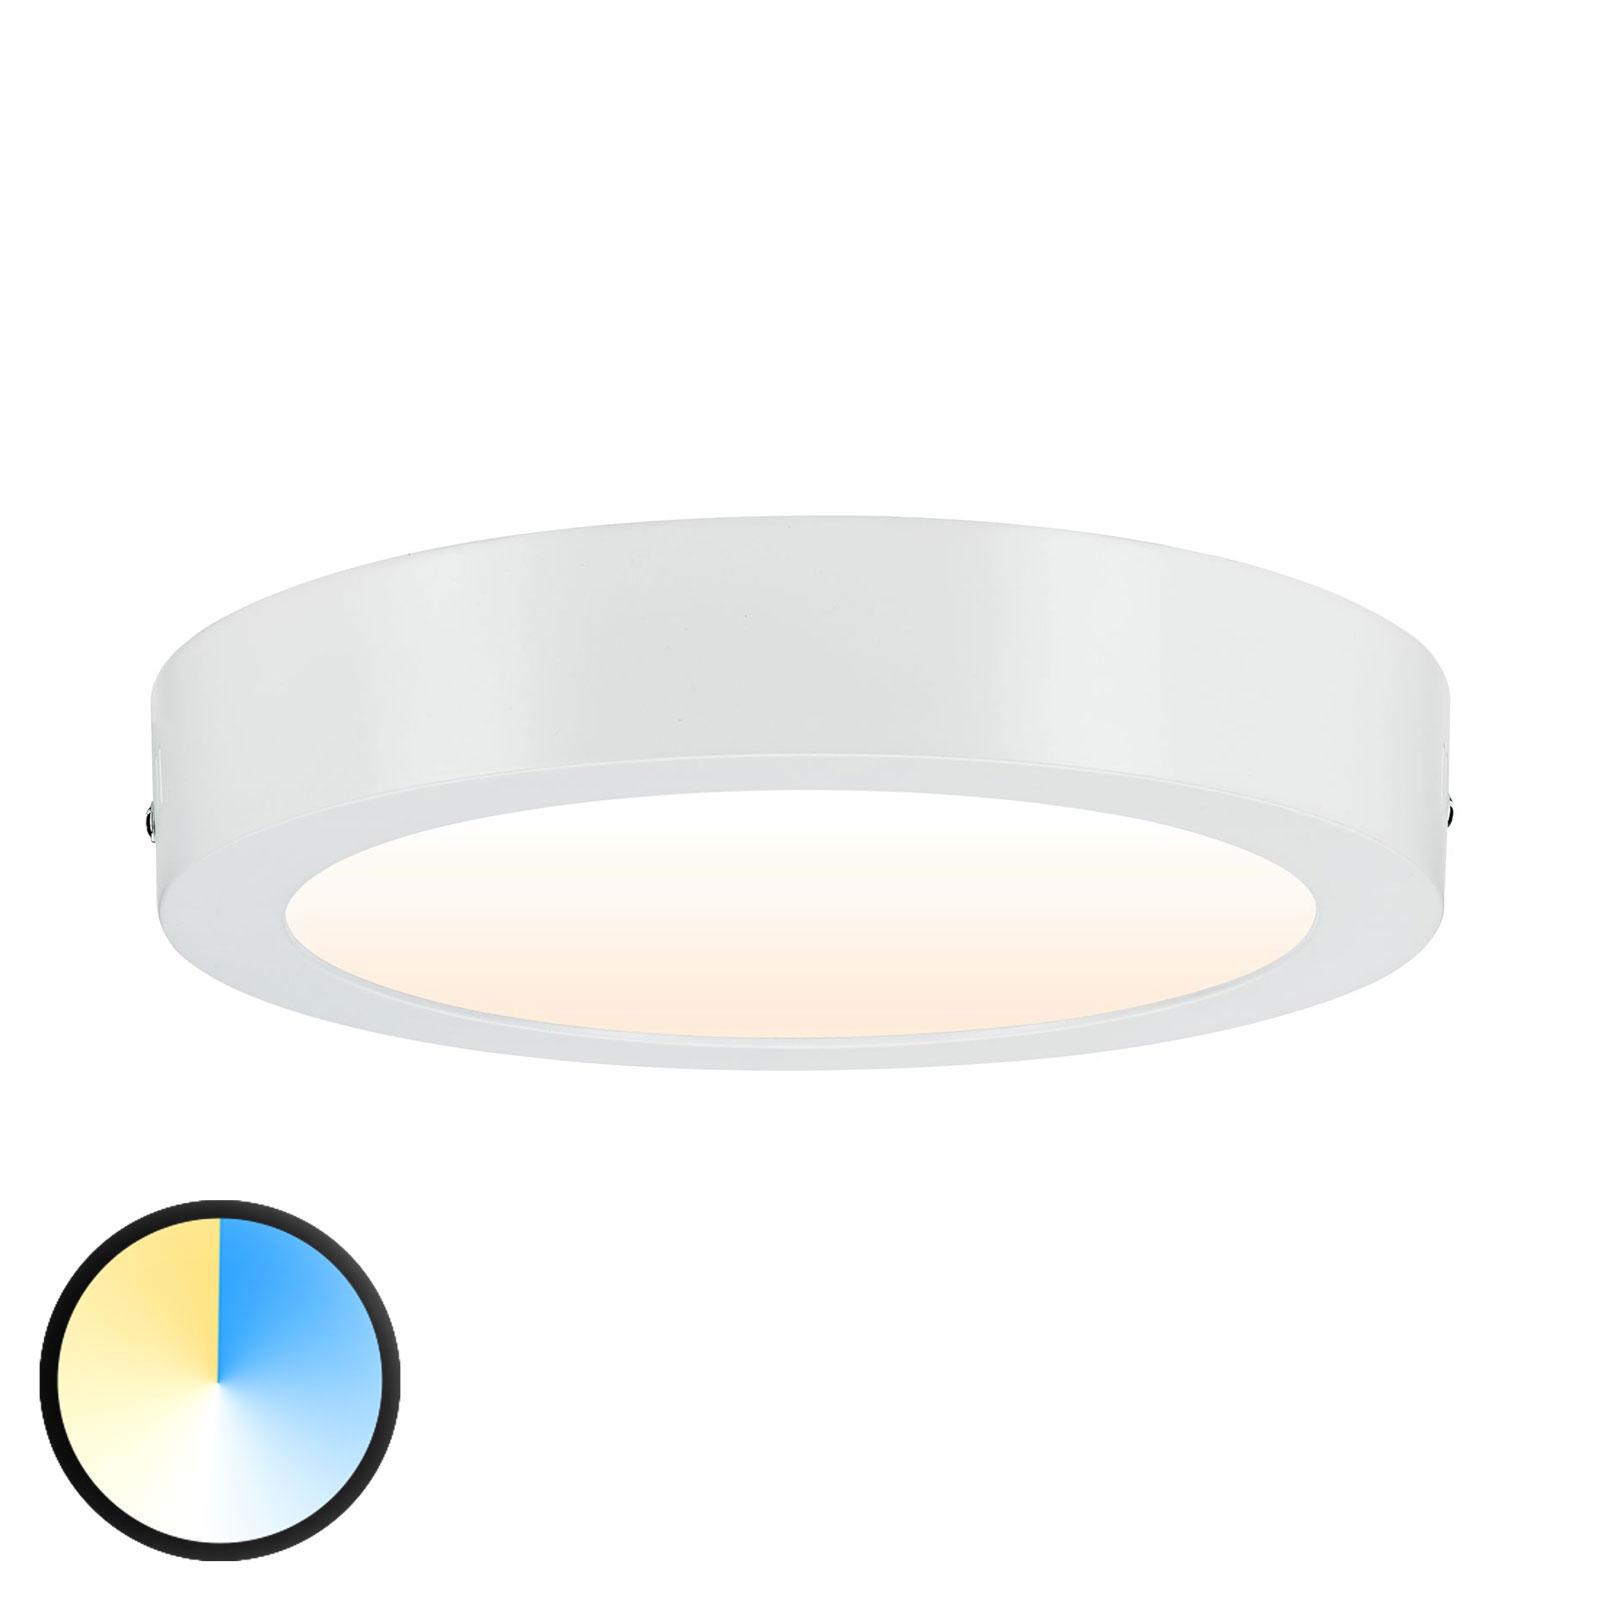 Paulmann Carpo LED plafondlamp rond wit 22,5cm